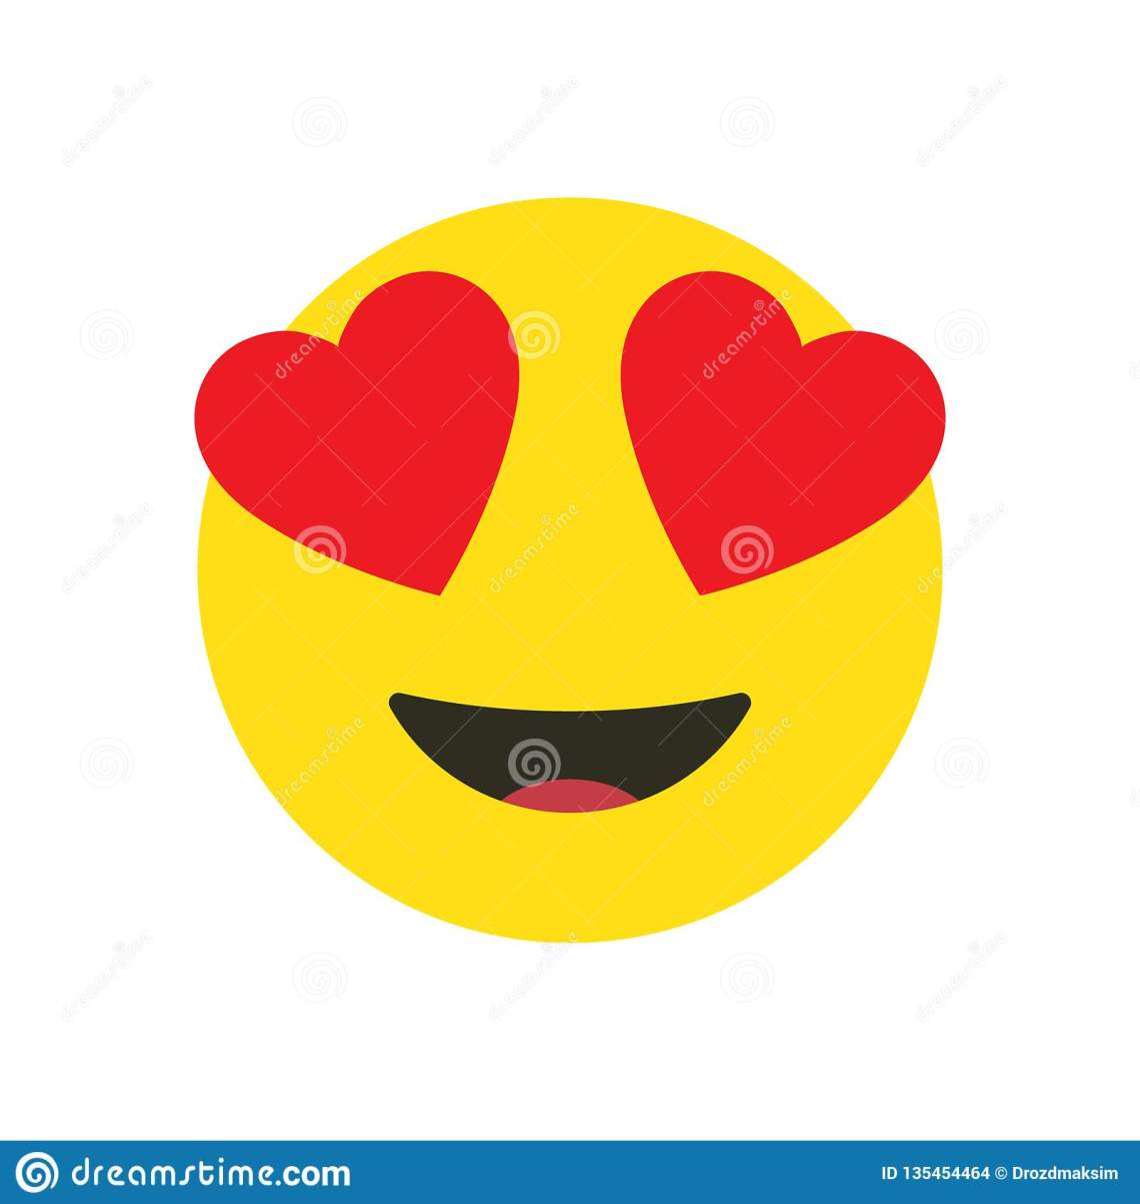 Download Love Emoji Icon Design Vector Stock Illustration ...